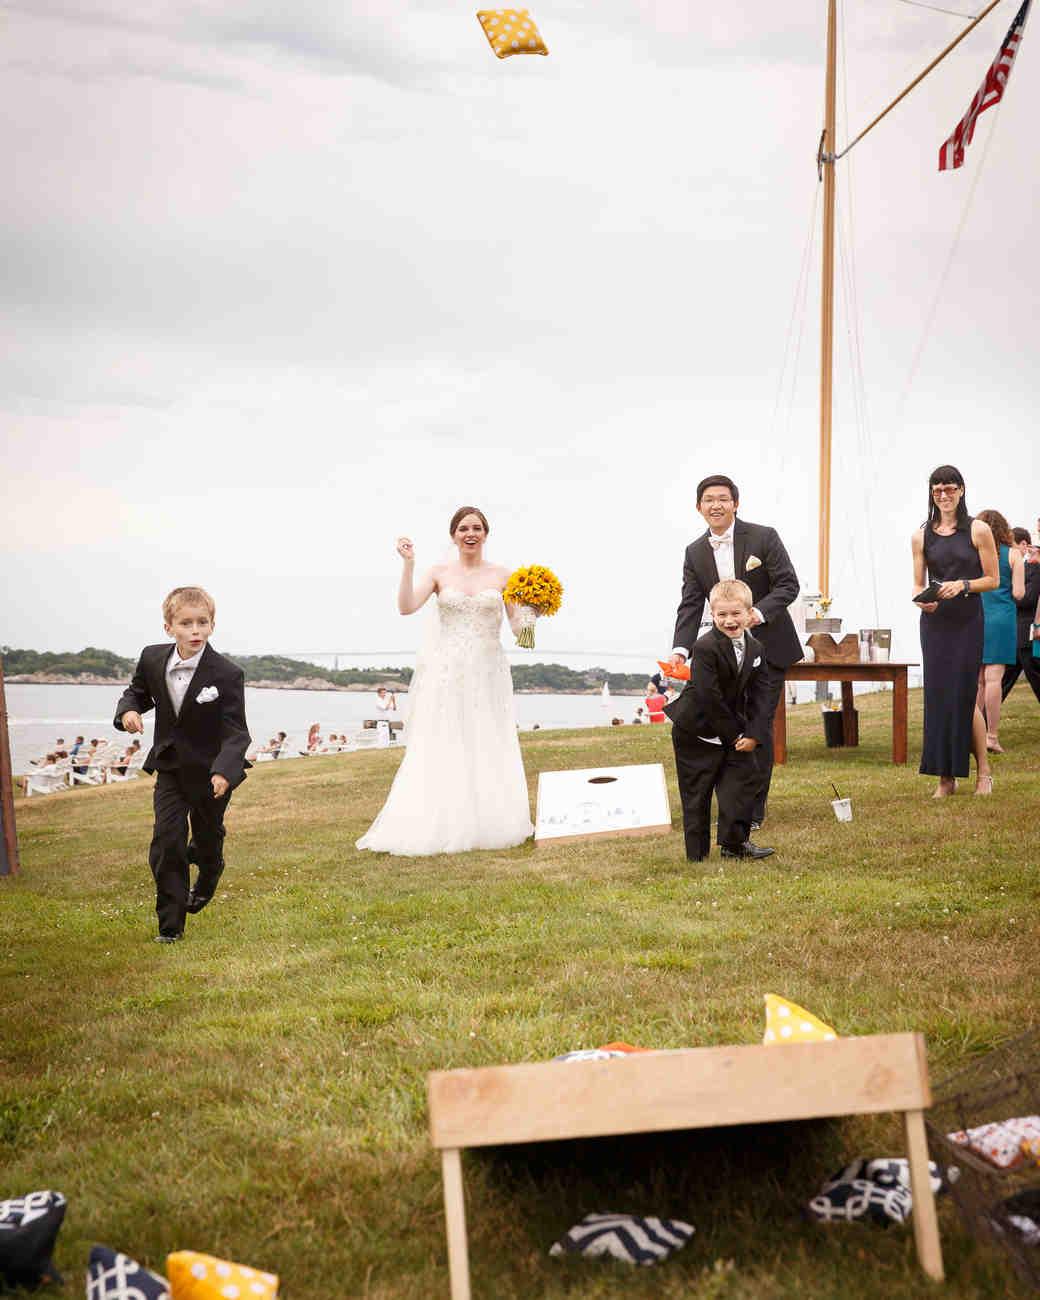 kristel-austin-wedding-cornhole-26-s11860-0415.jpg